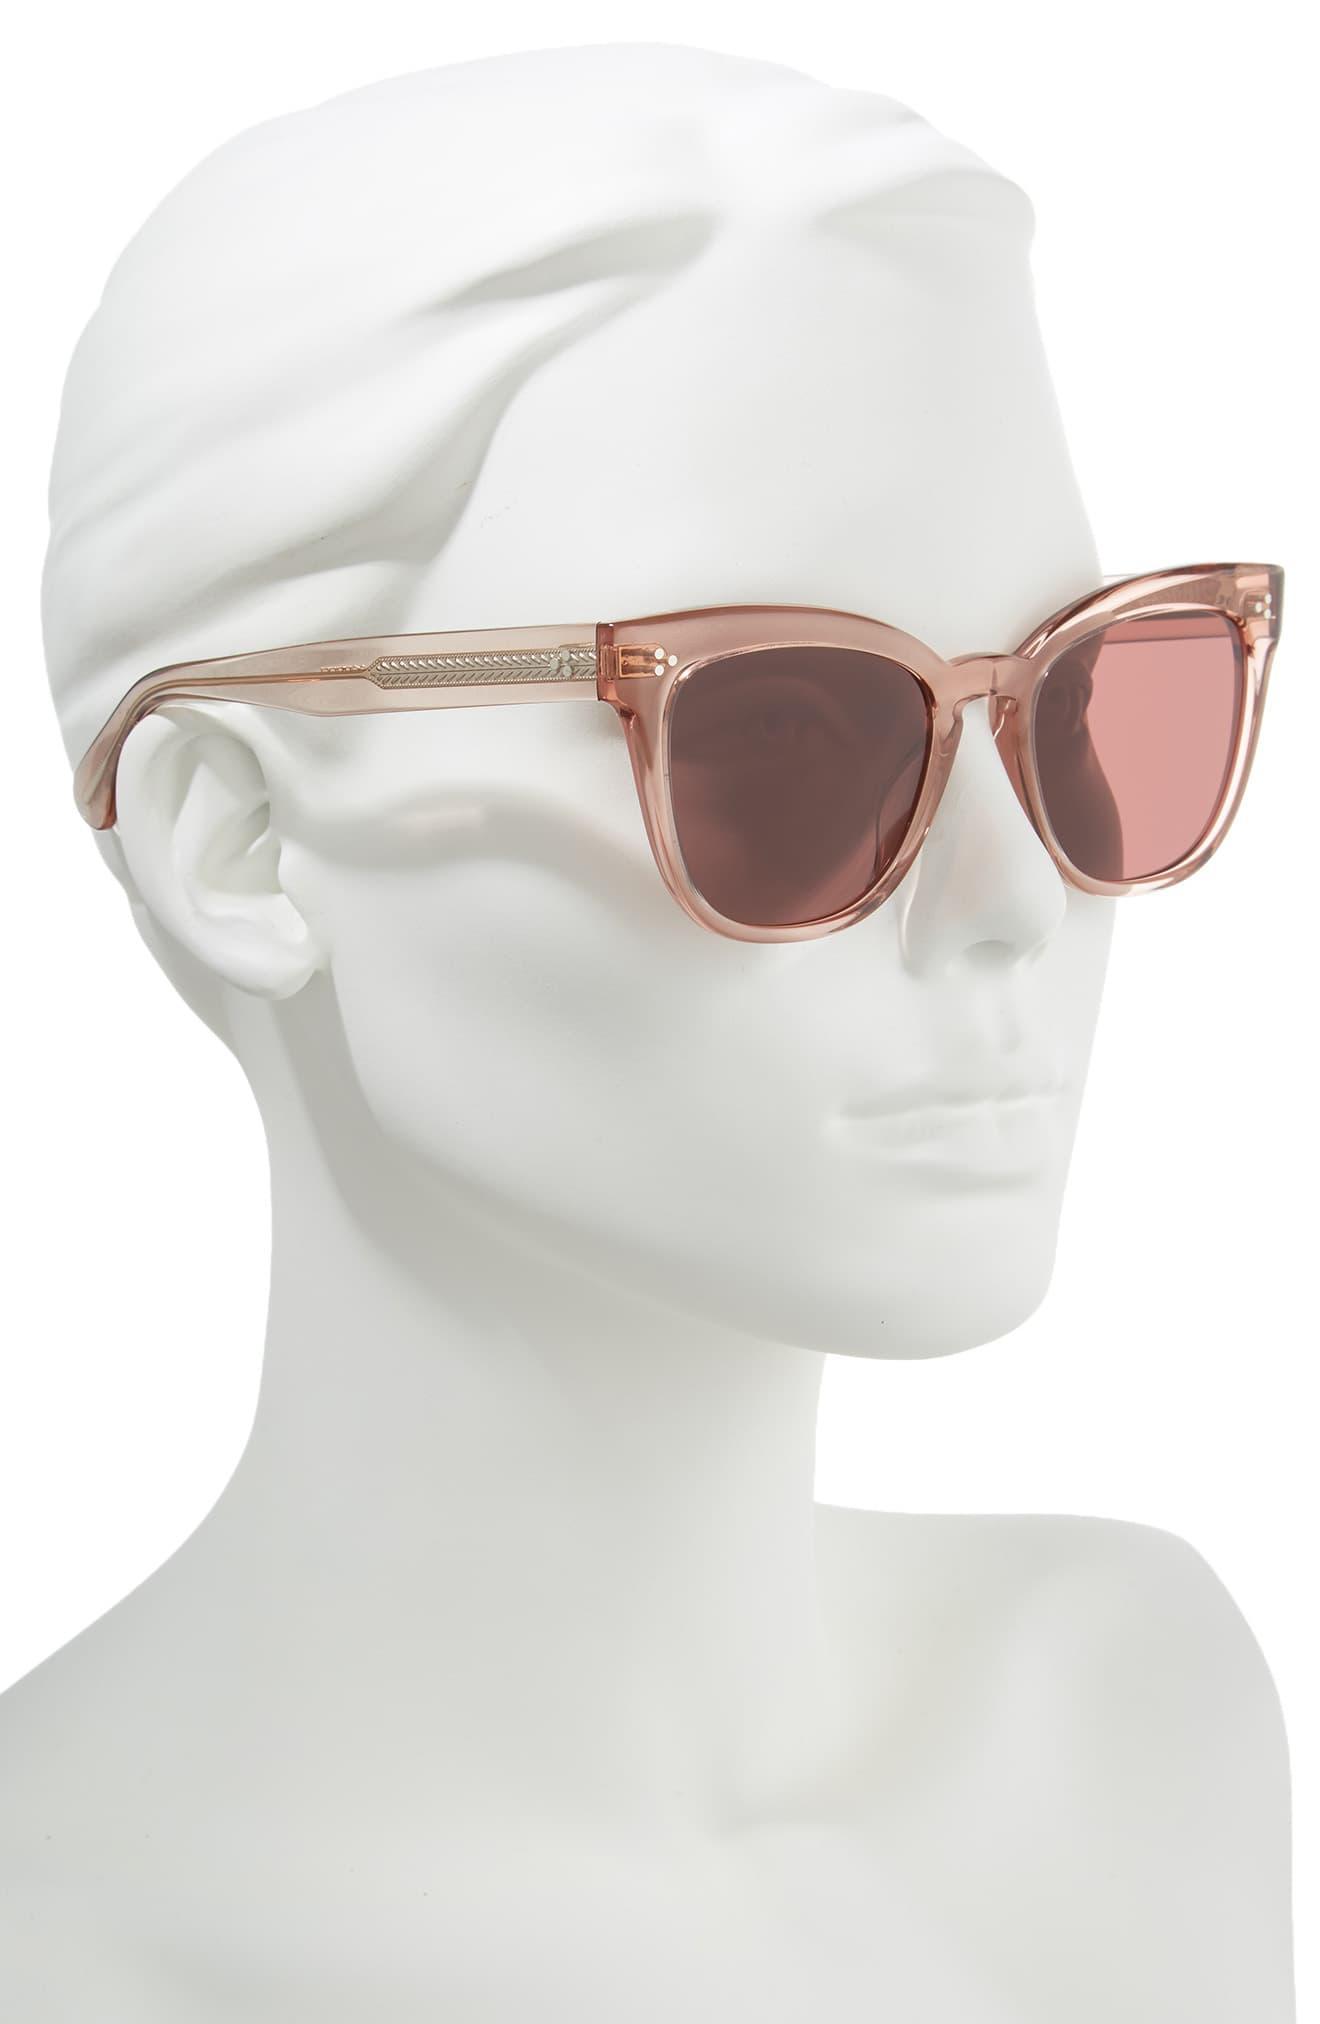 e597f87b28 Oliver Peoples - Pink Marianela 54mm Cat Eye Sunglasses - Washed Rose -  Lyst. View fullscreen